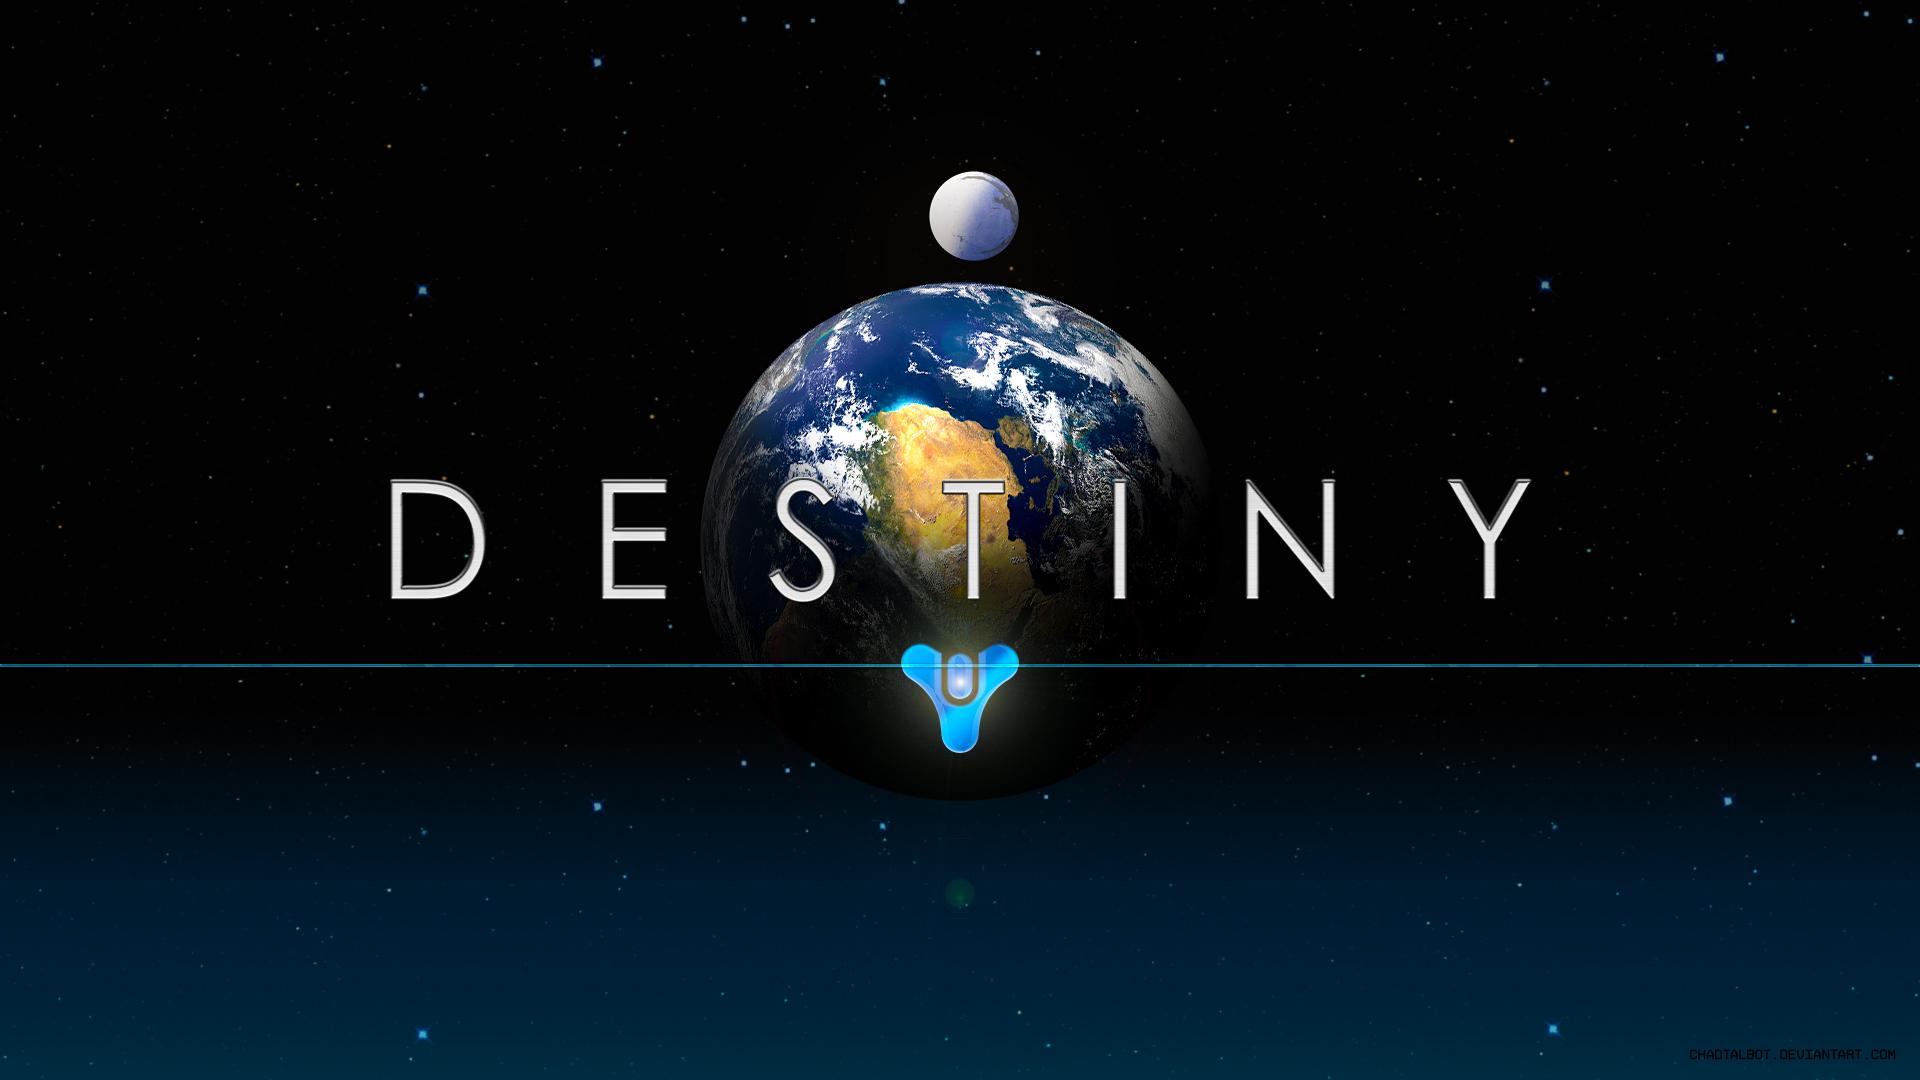 Destiny clipart 1920x1080. Desktop clipartfox game wallpaper